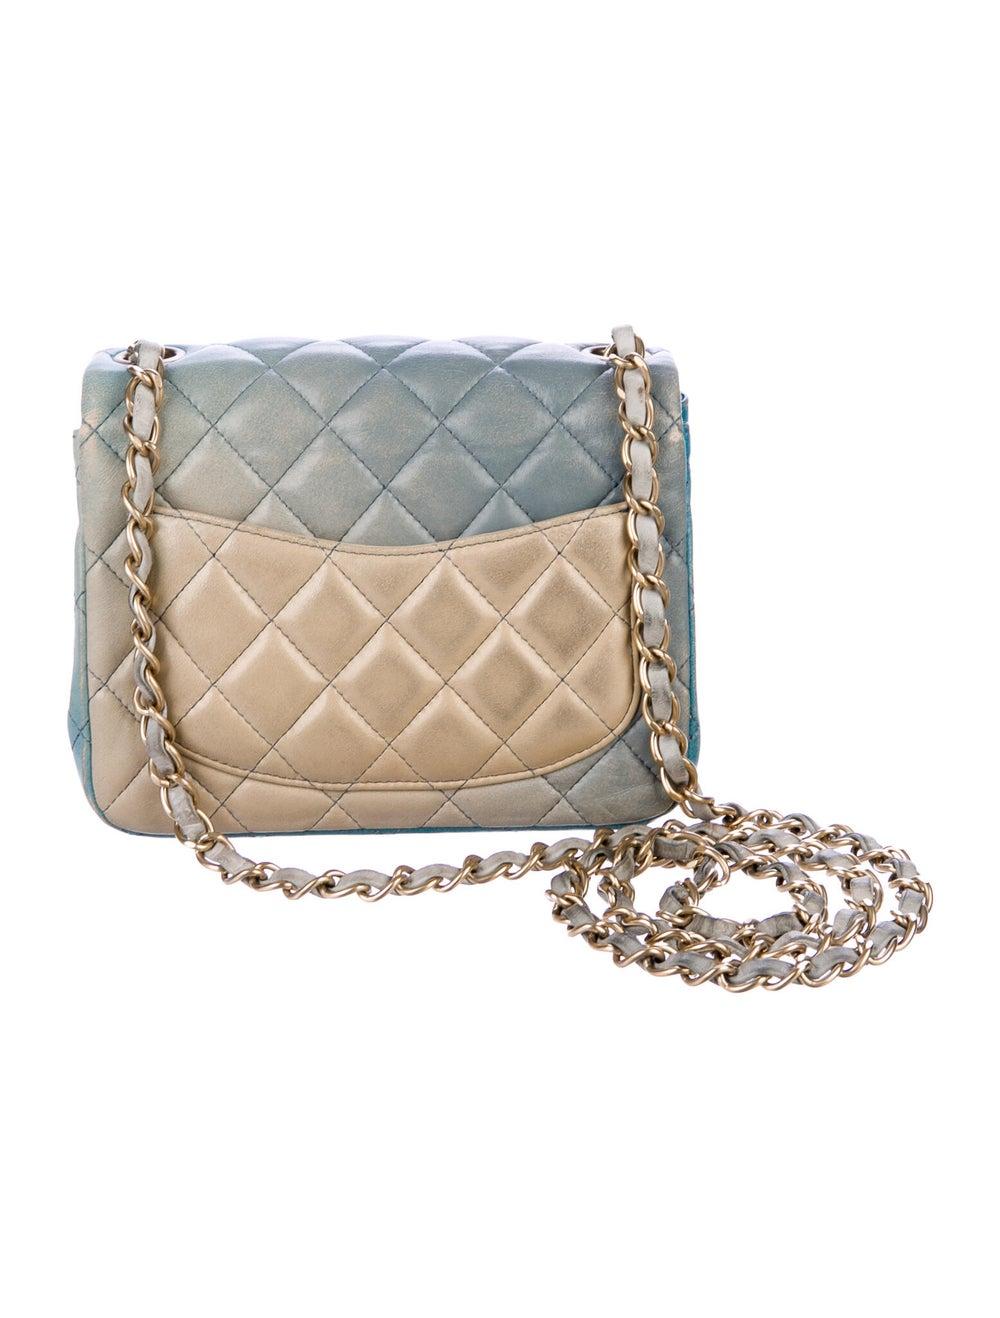 Chanel Classic Degradé Mini Square Flap Bag Blue - image 4